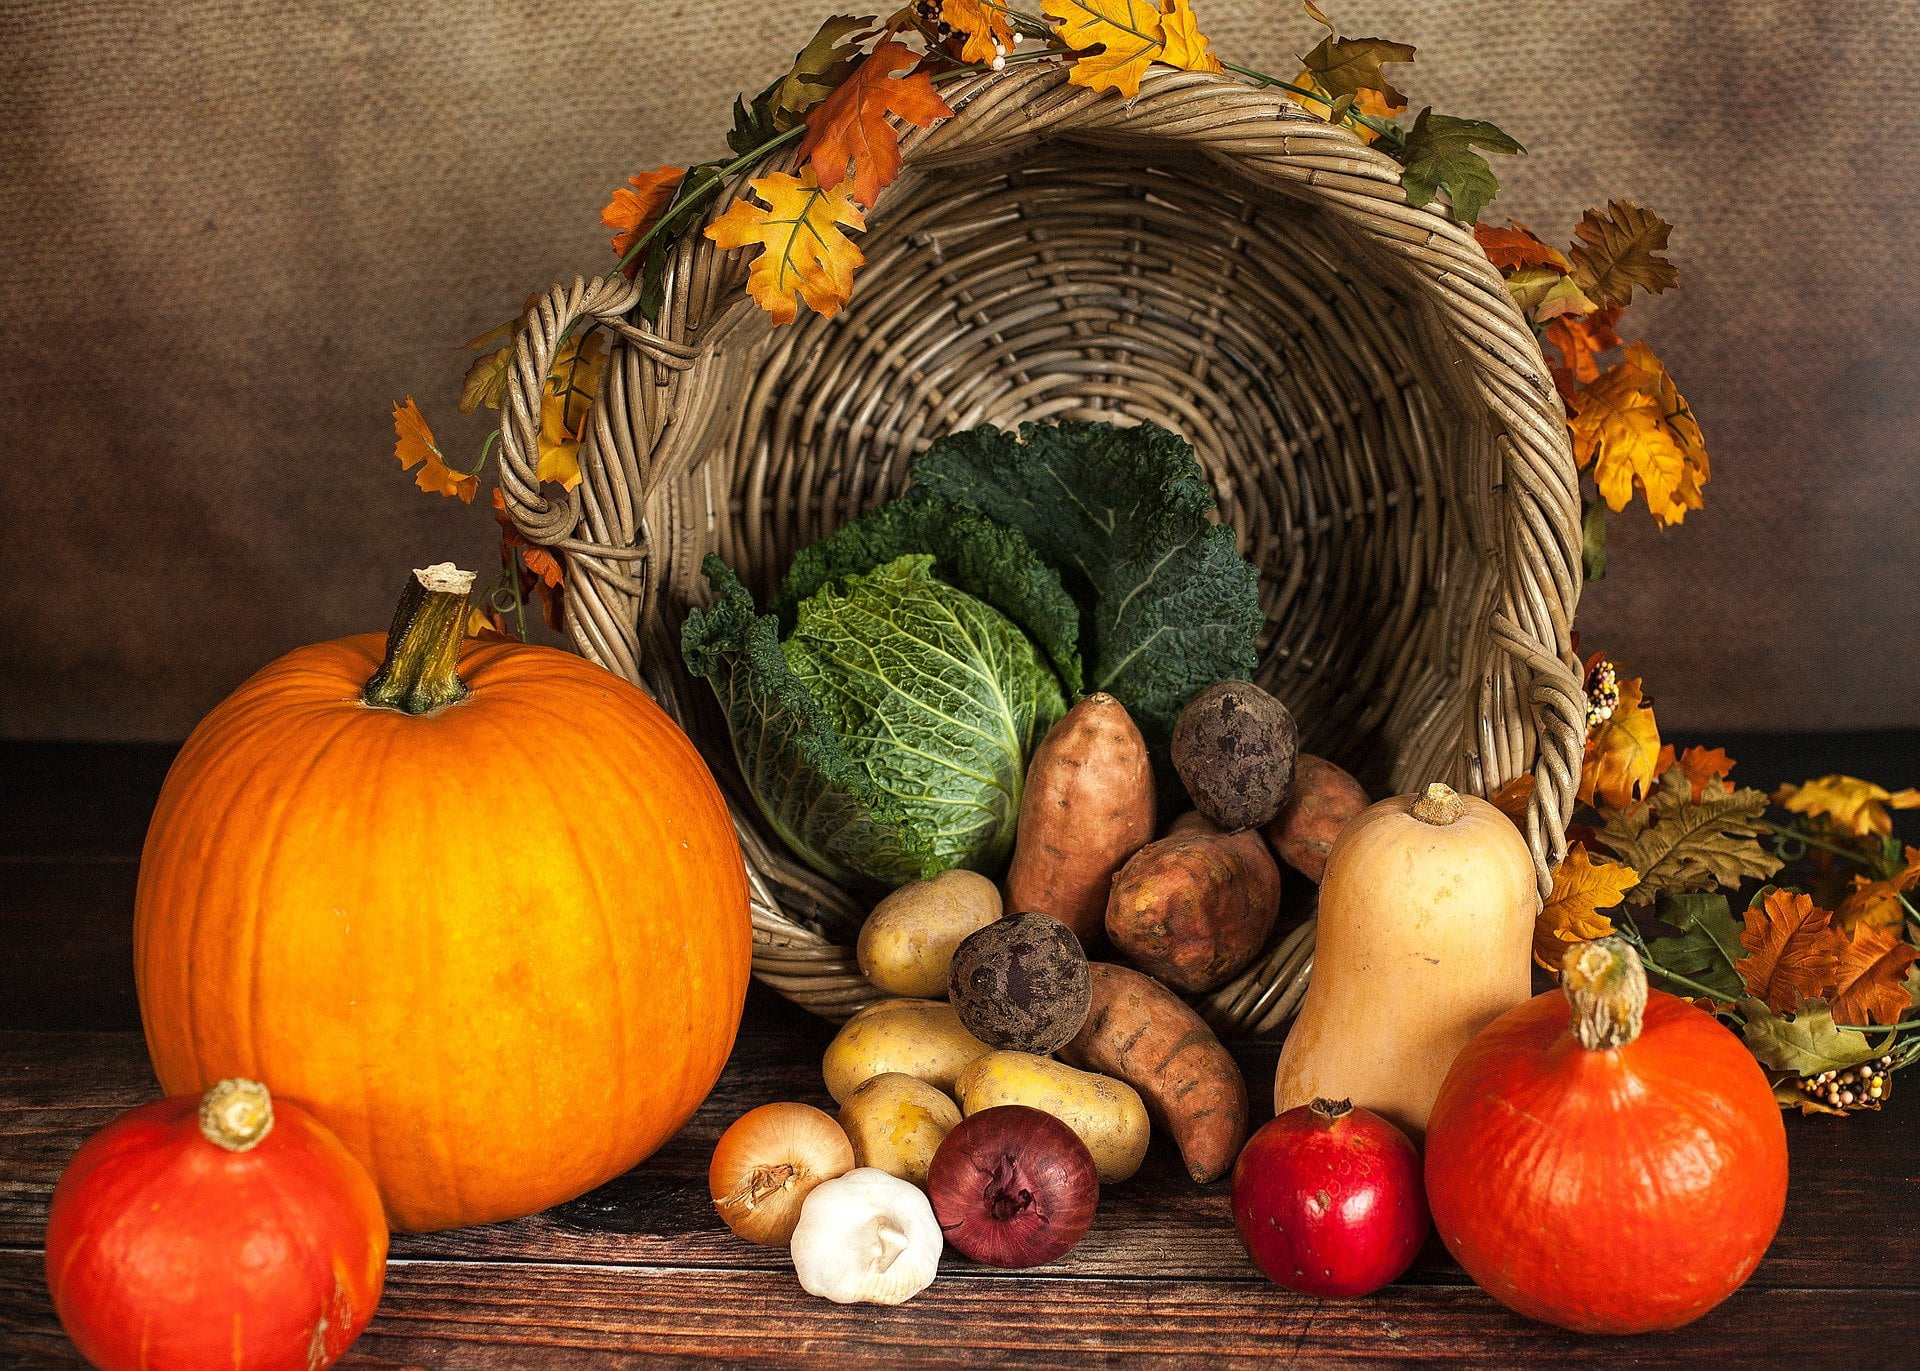 frutta e verdura autunno